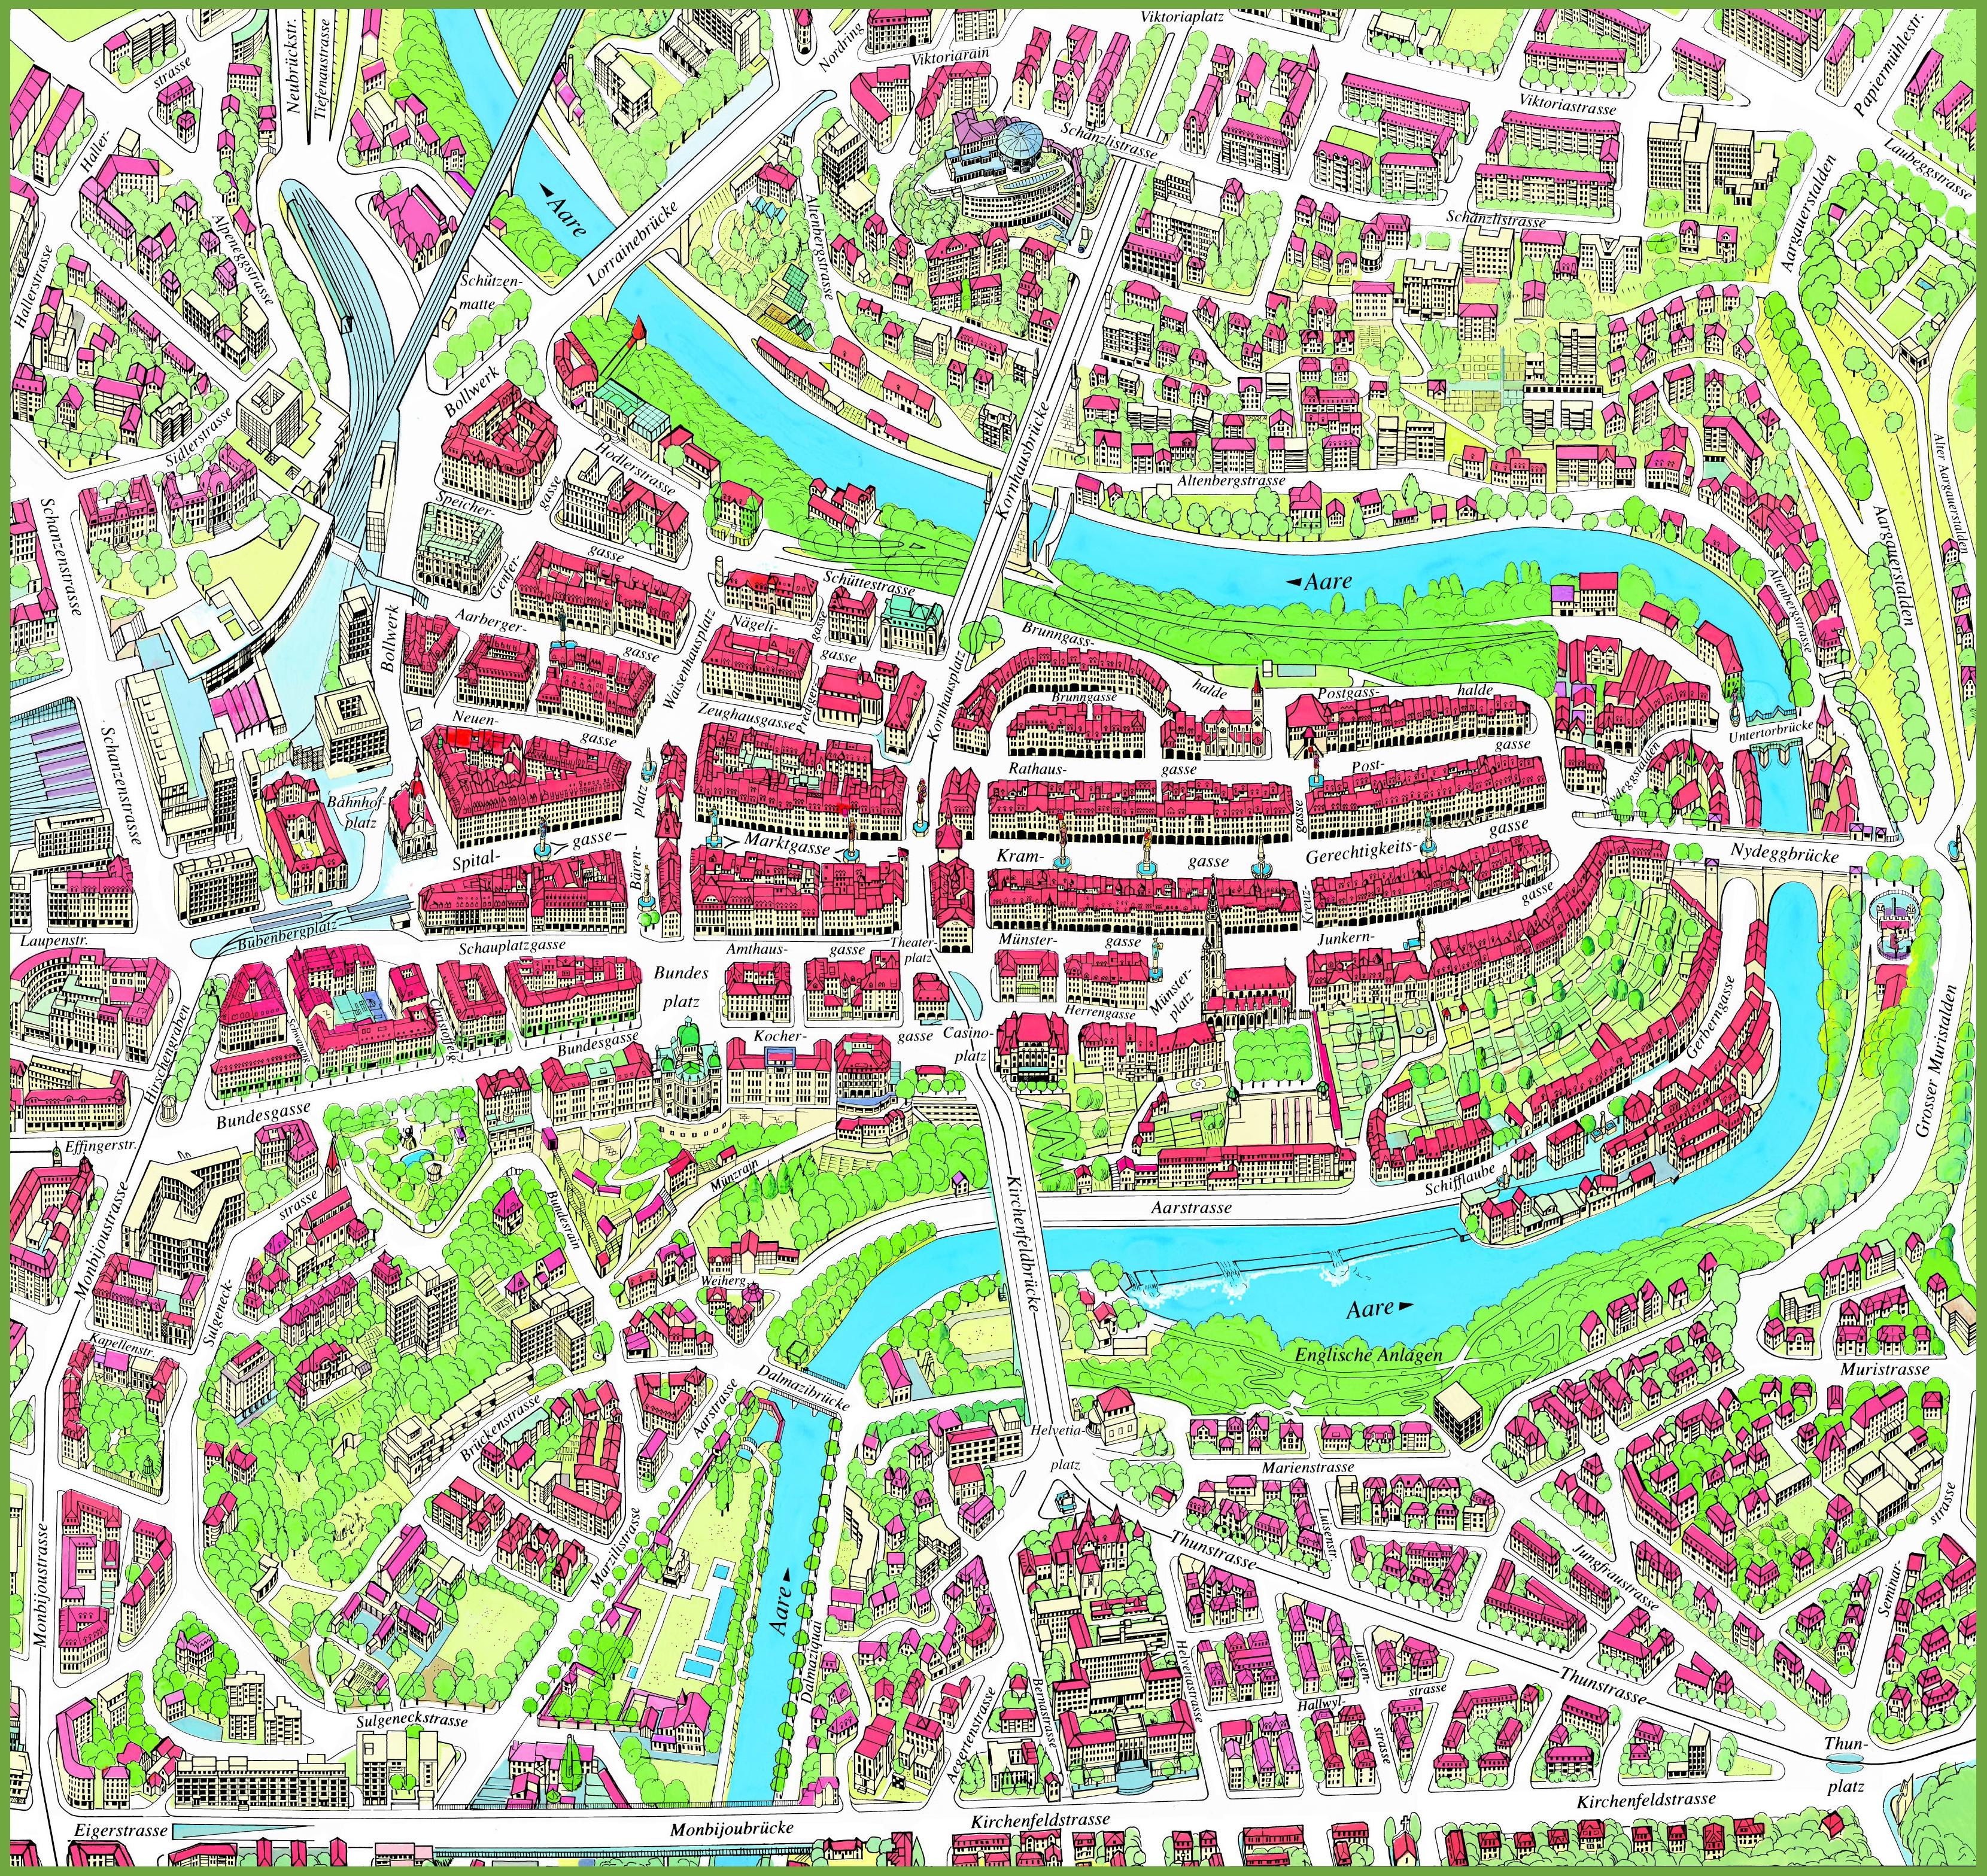 Bern Switzerland Map Bern city center map Bern Switzerland Map